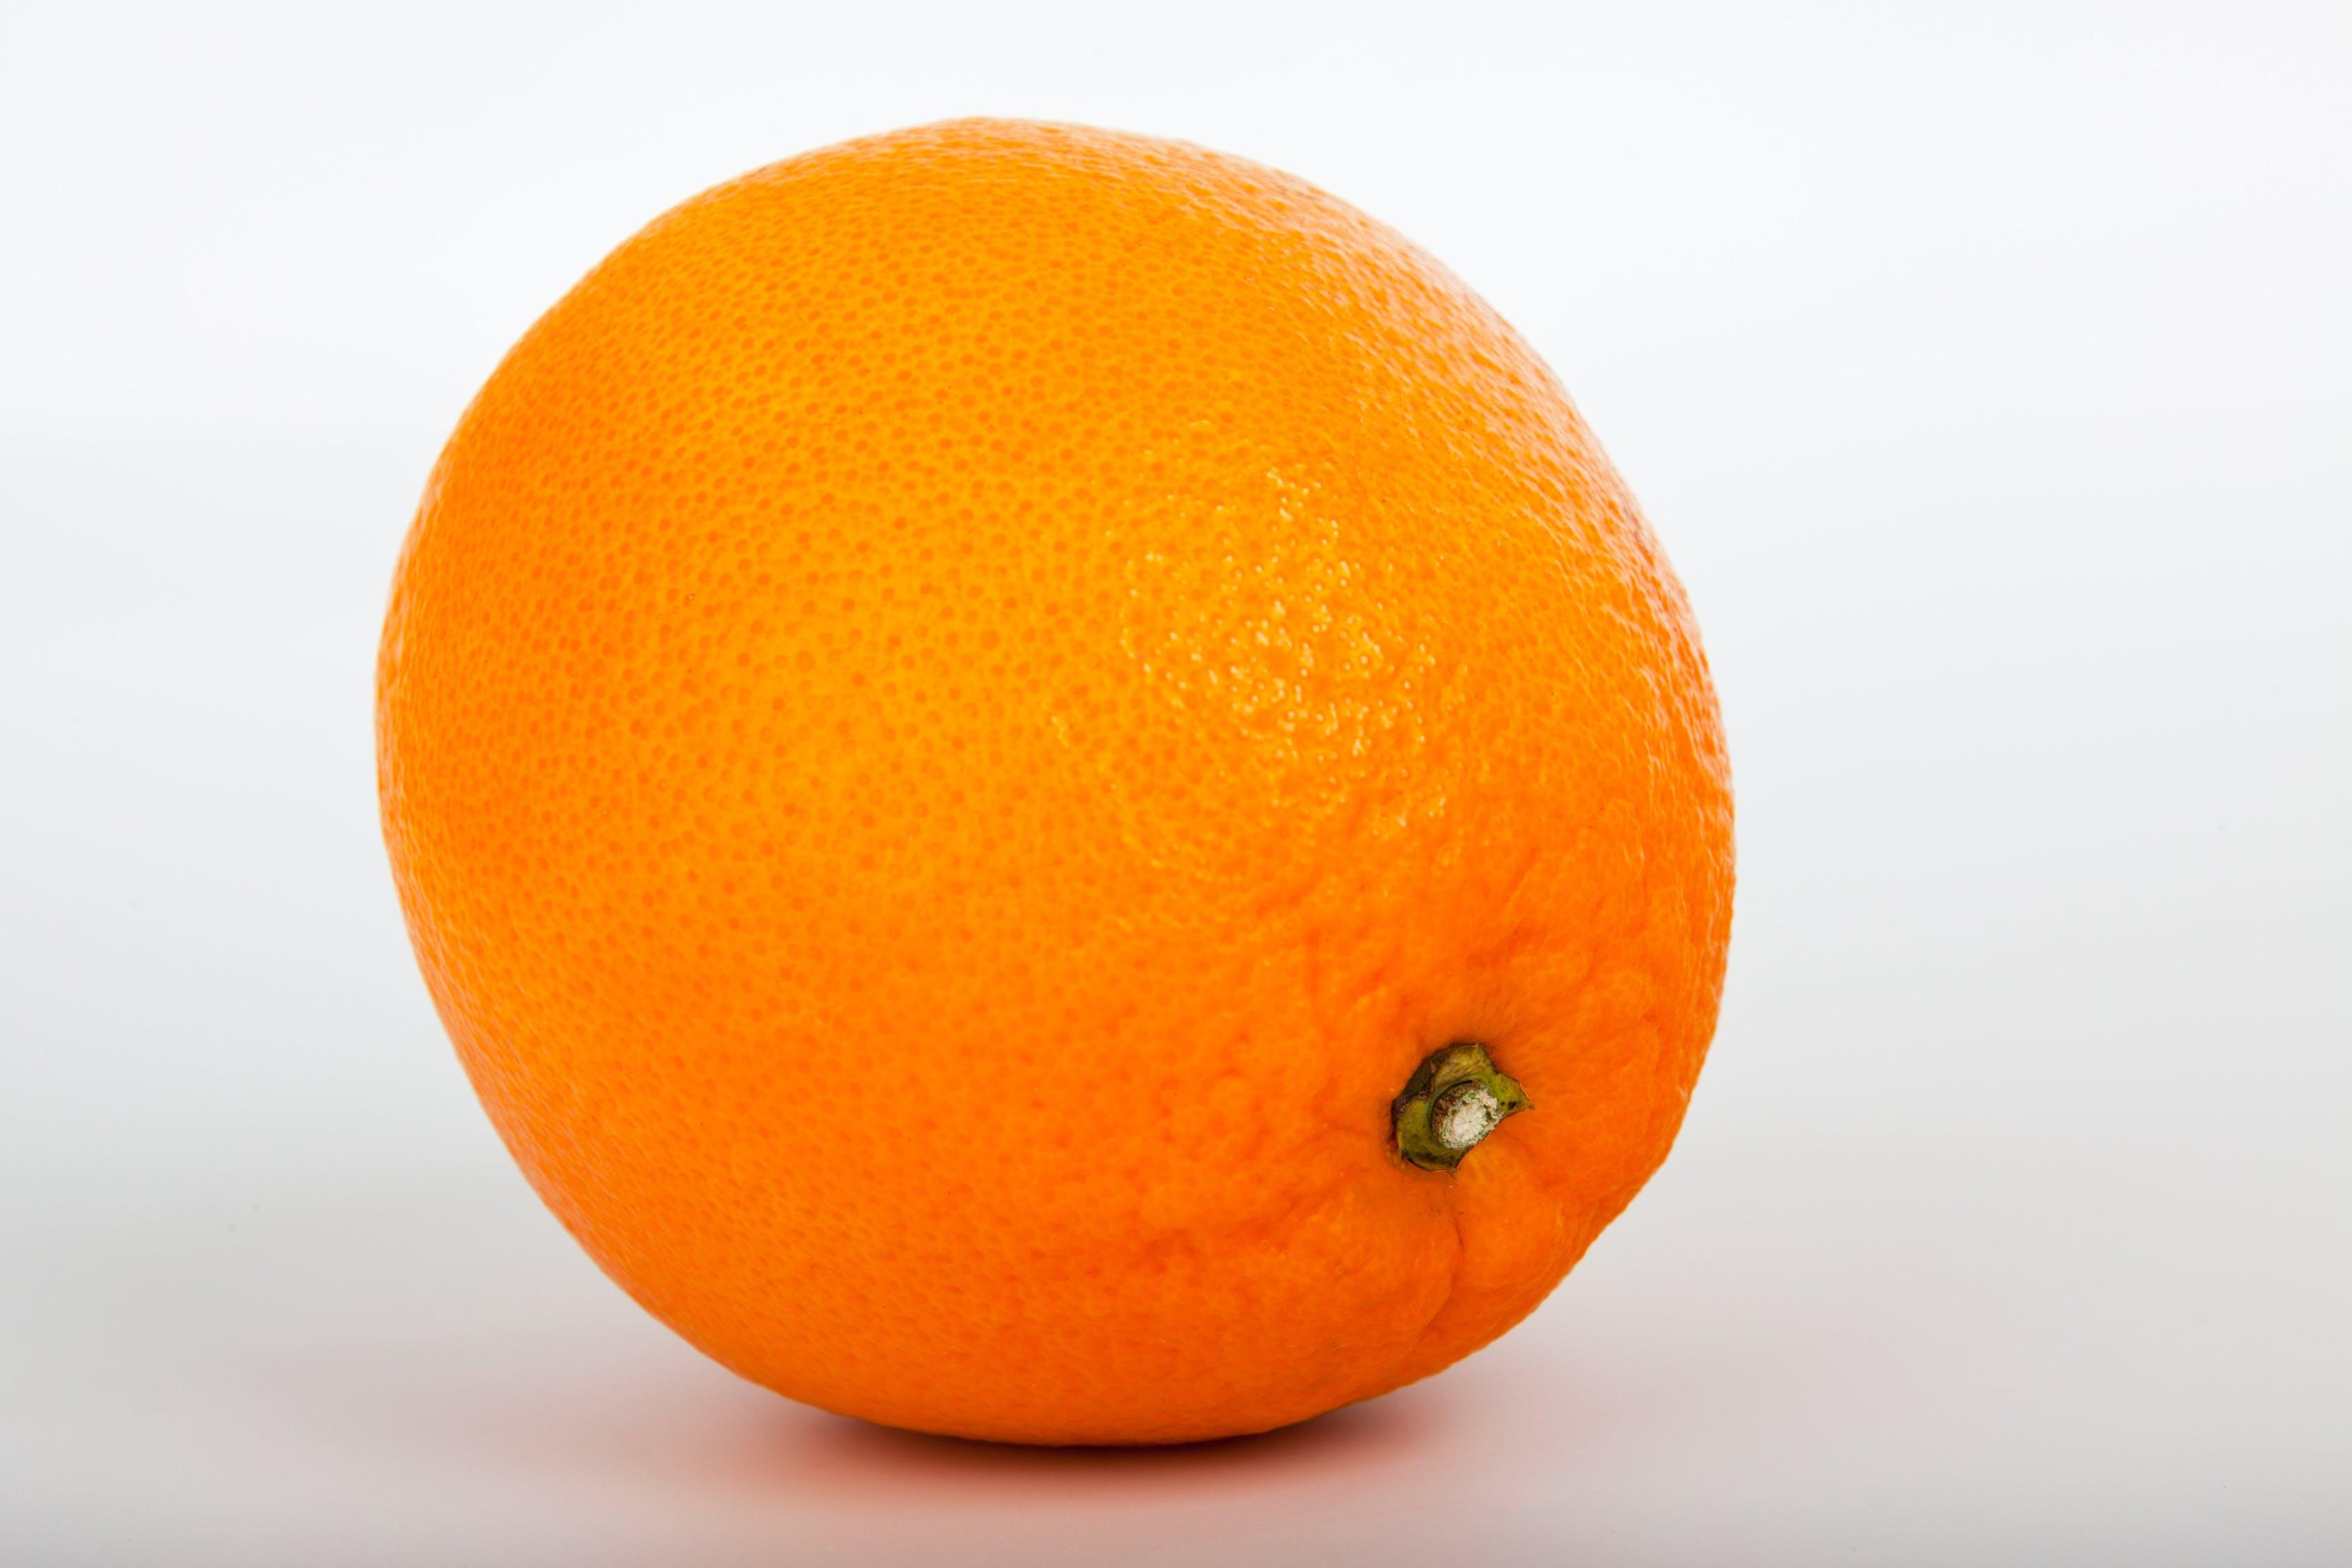 https://images.pexels.com/photos/42059/citrus-diet-food-fresh-42059.jpeg?auto=compress&cs=tinysrgb&dpr=3&h=750&w=1260